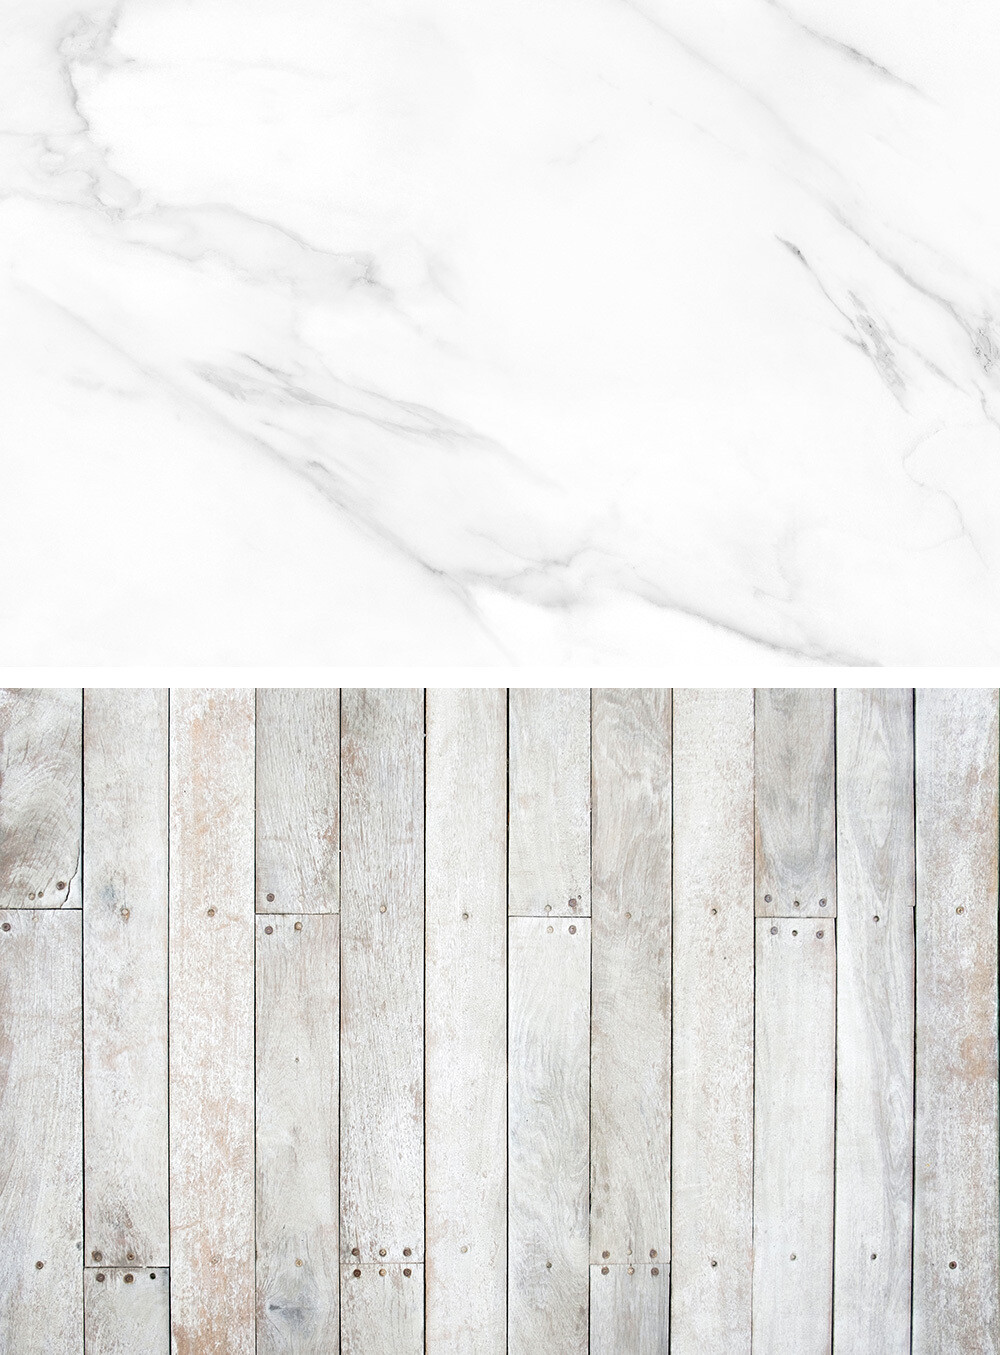 PVC Double Sided Backgrounds 58x86 cm - E02